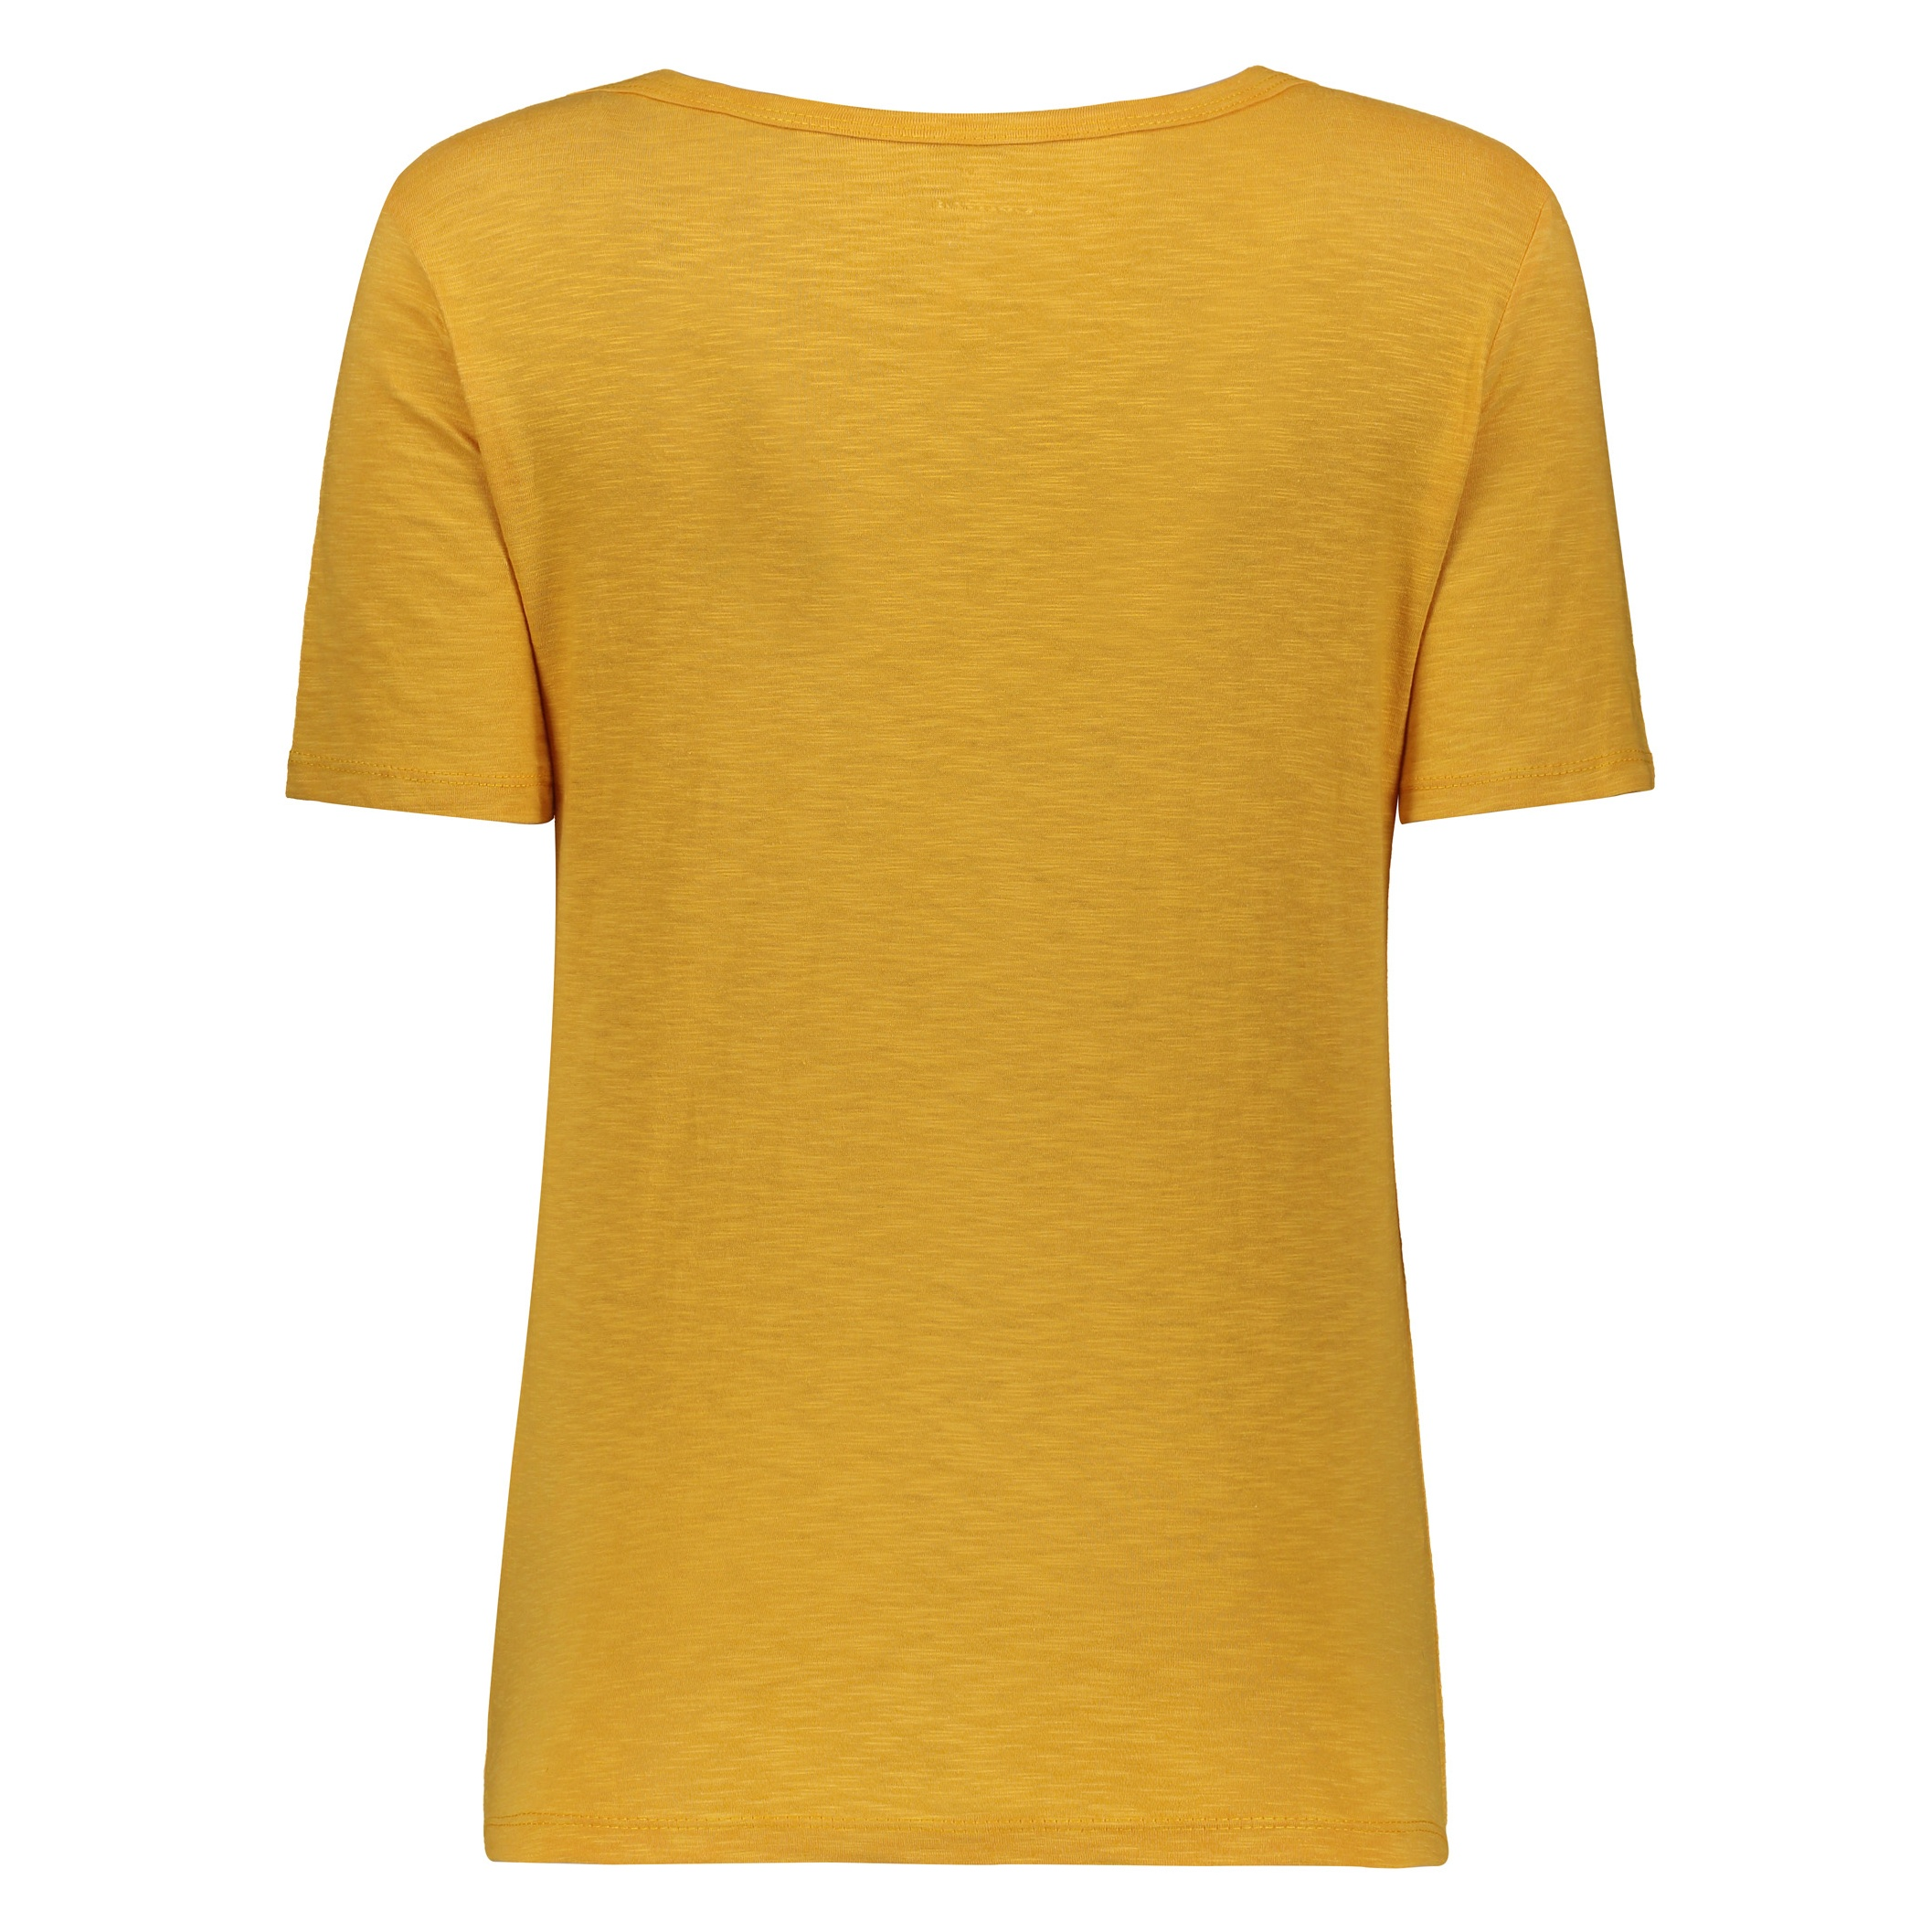 تی شرت نه کالینز مدل CL1034536-MUSTARD YELLOW